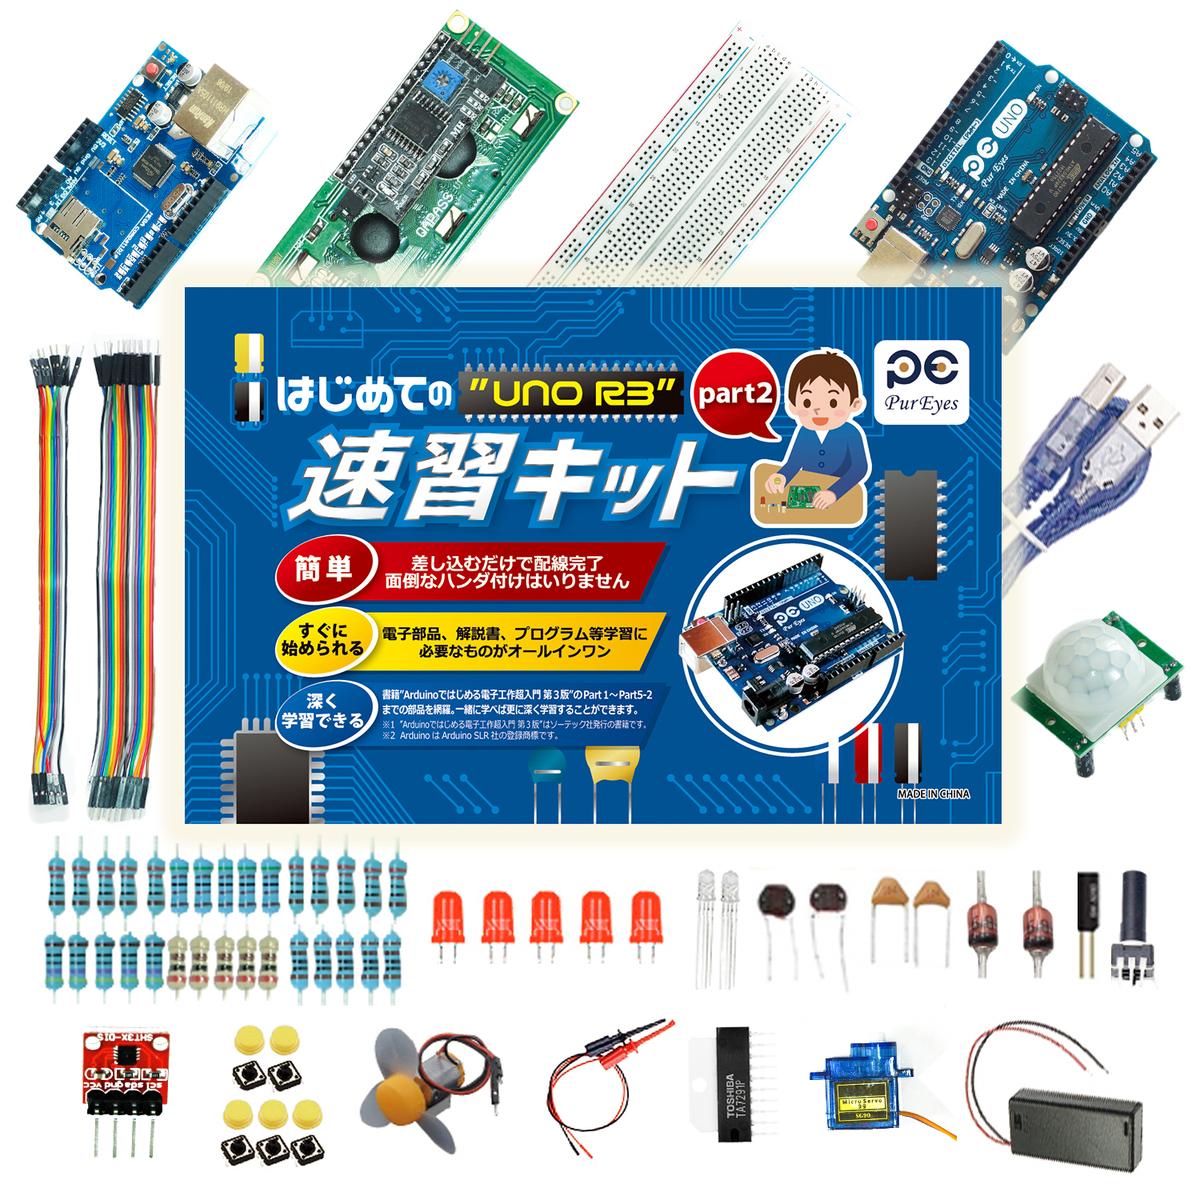 PurEyes Arduinoではじめる電子工作第3版対応 スターターキット-PDF教本ダウンロード特典付き